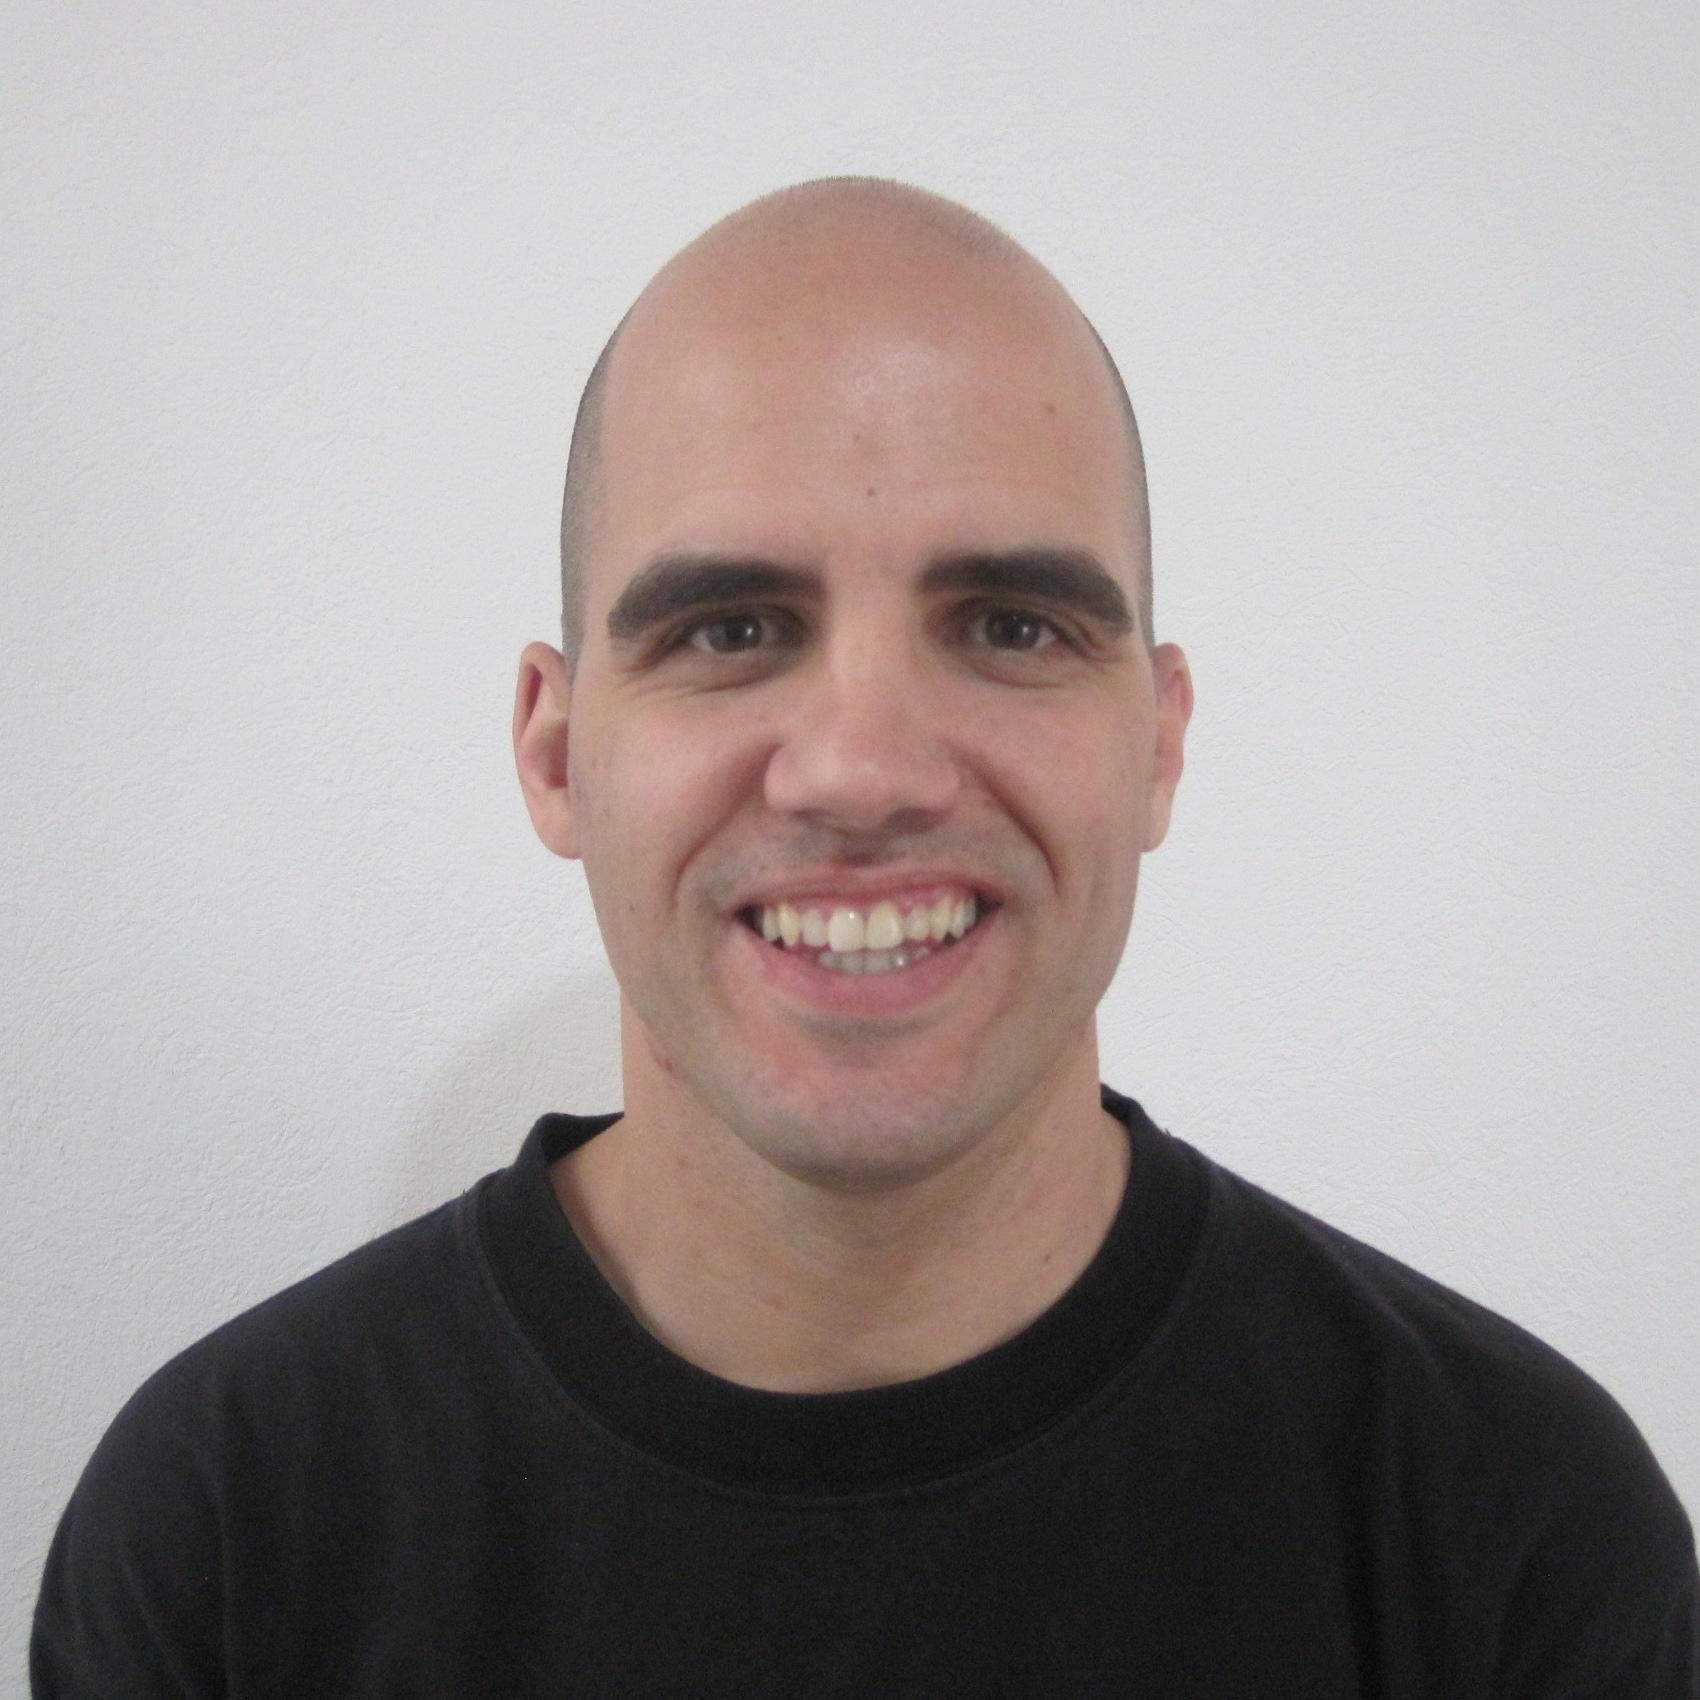 Jordi Almirall